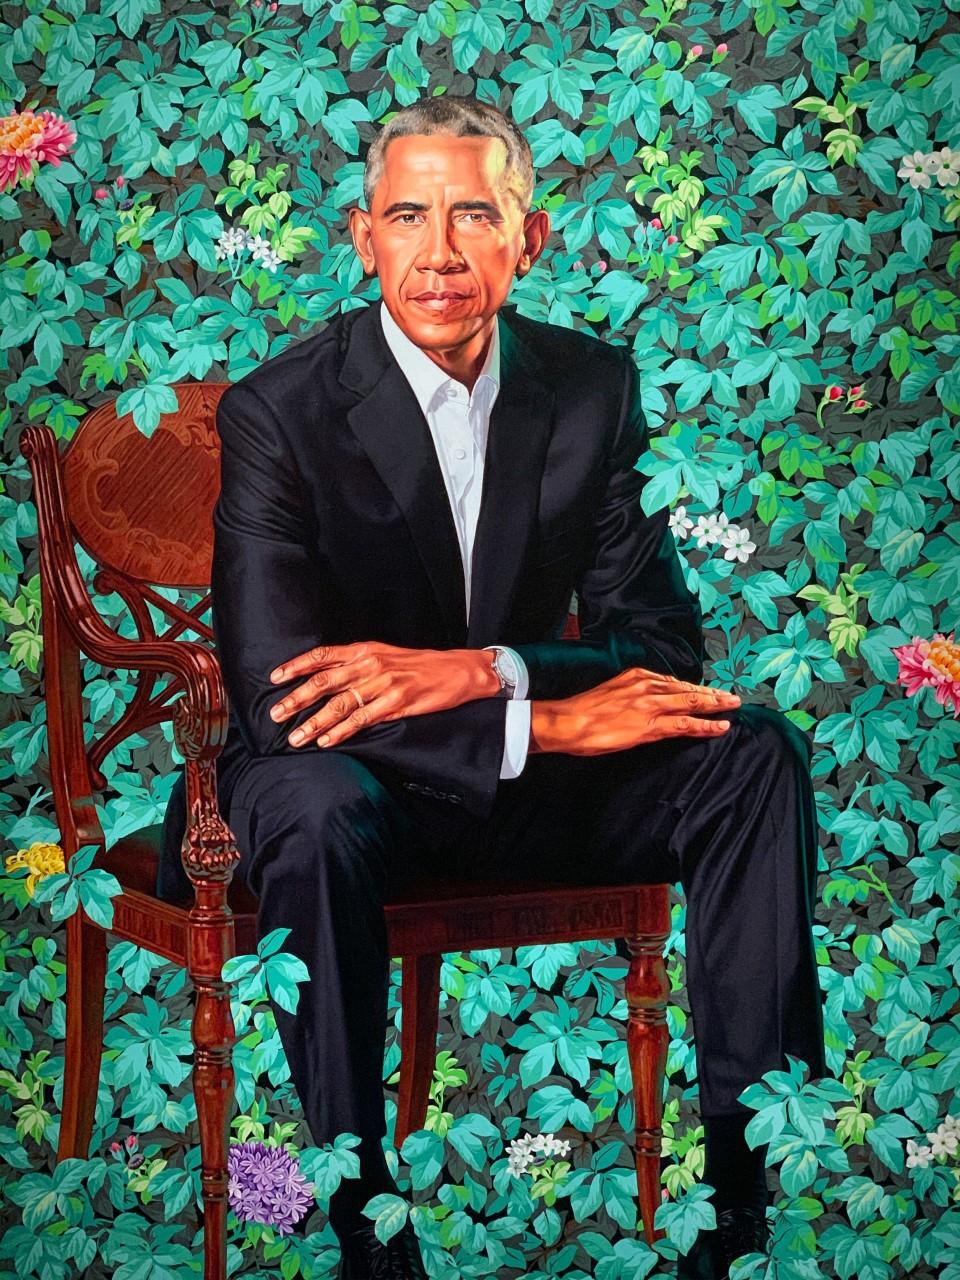 President Barack Obama National Portrait Gallery